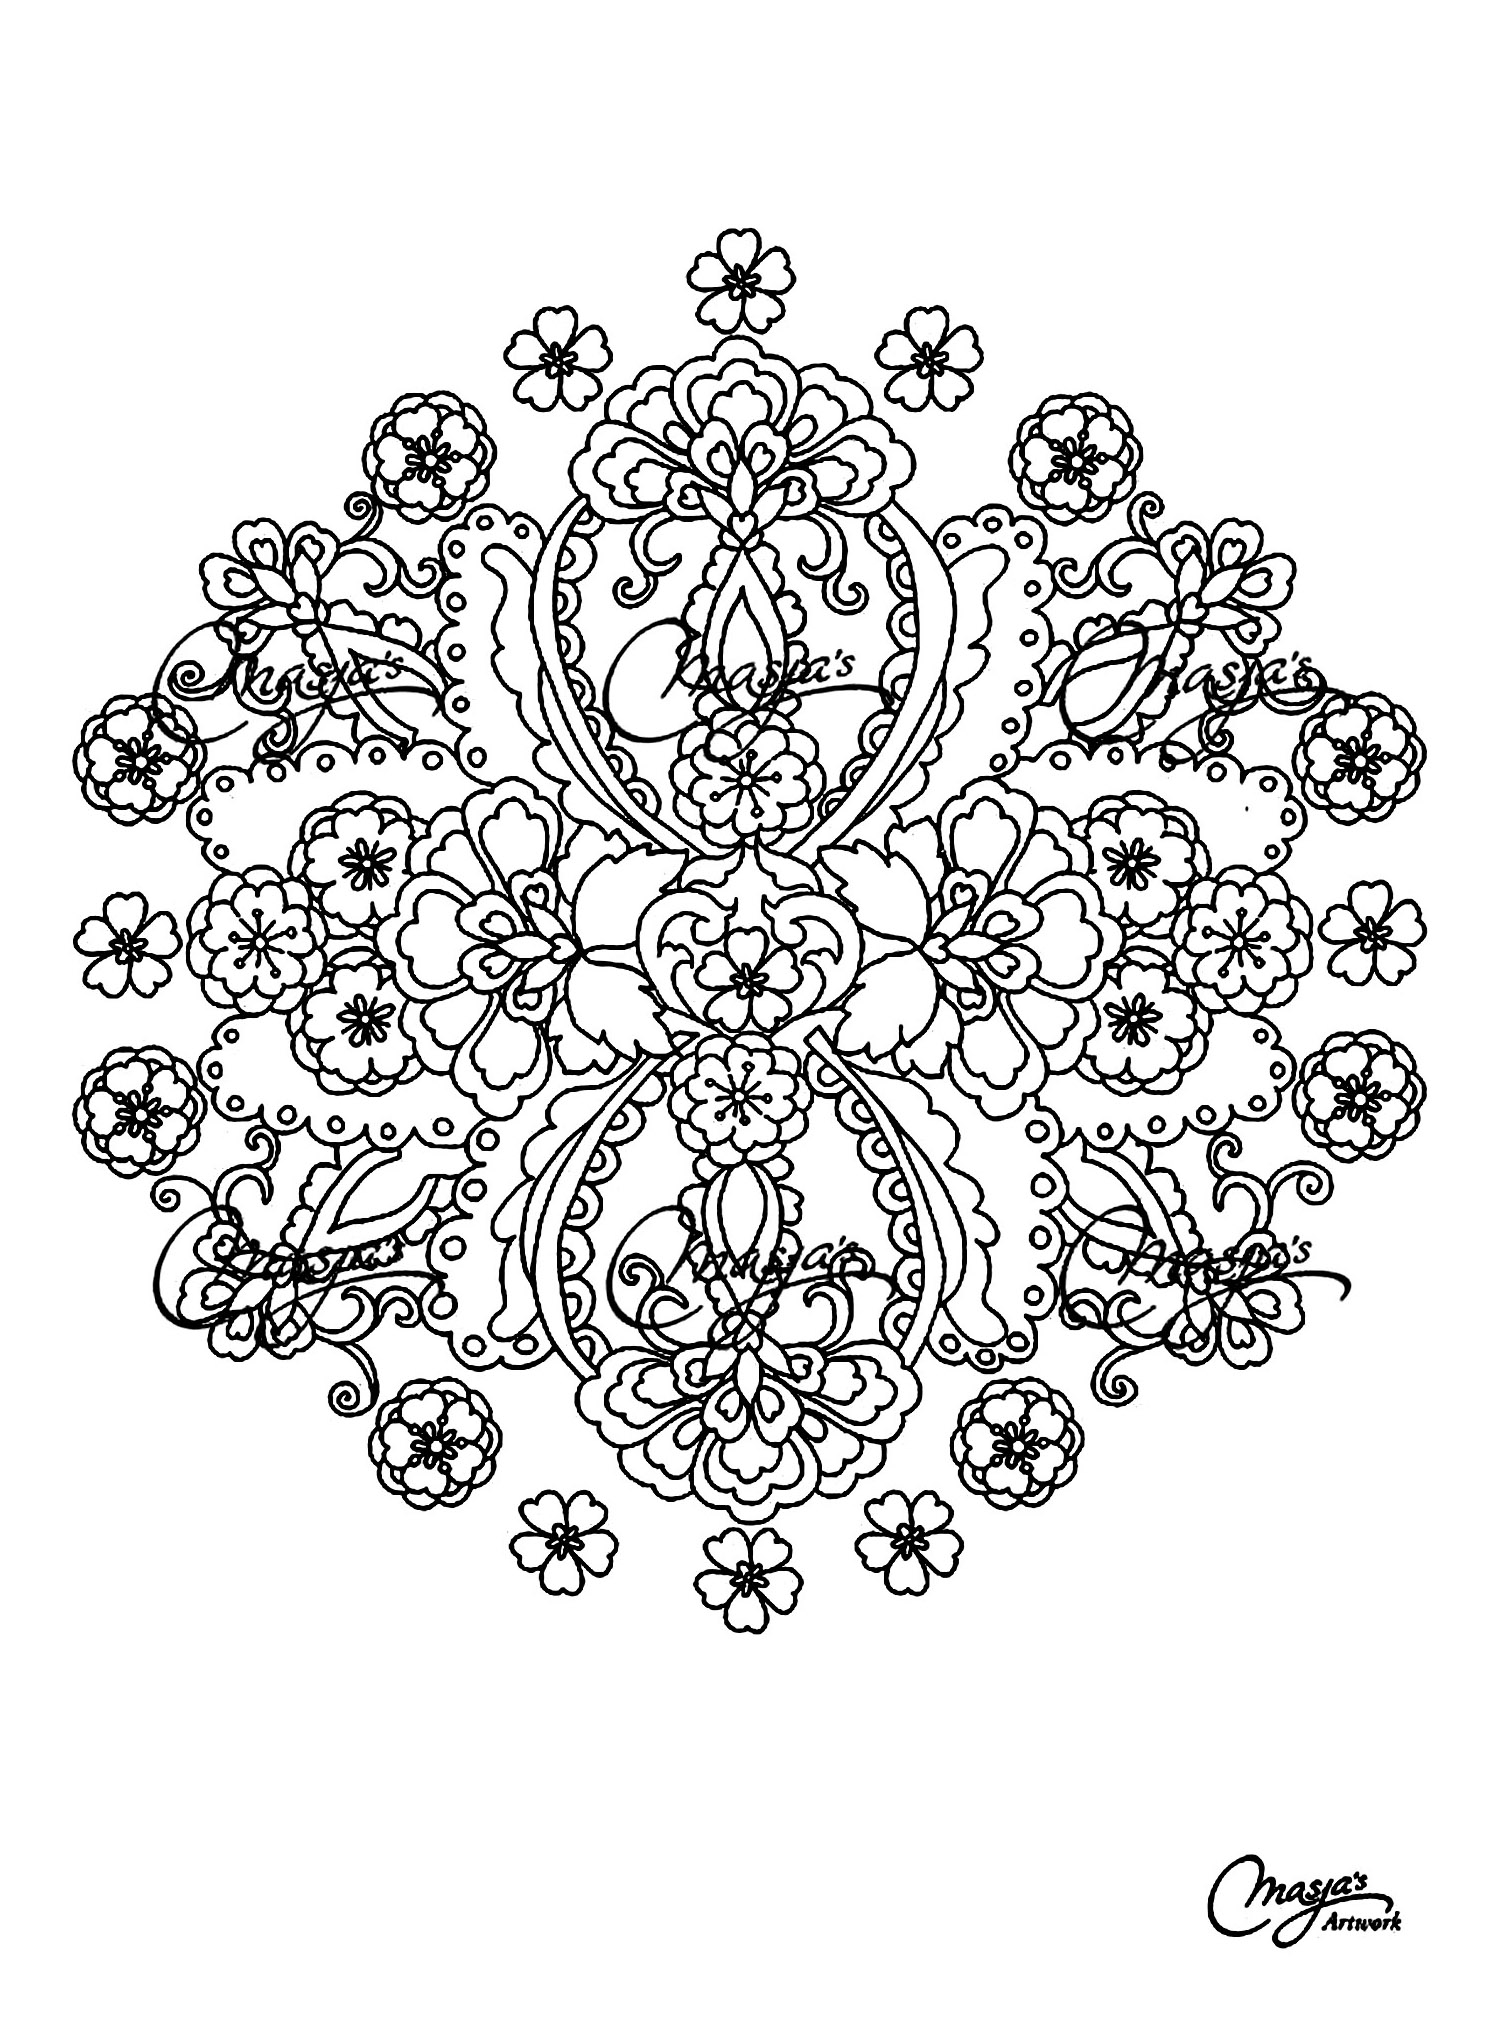 Colorear para adultos : Mandalas - 44